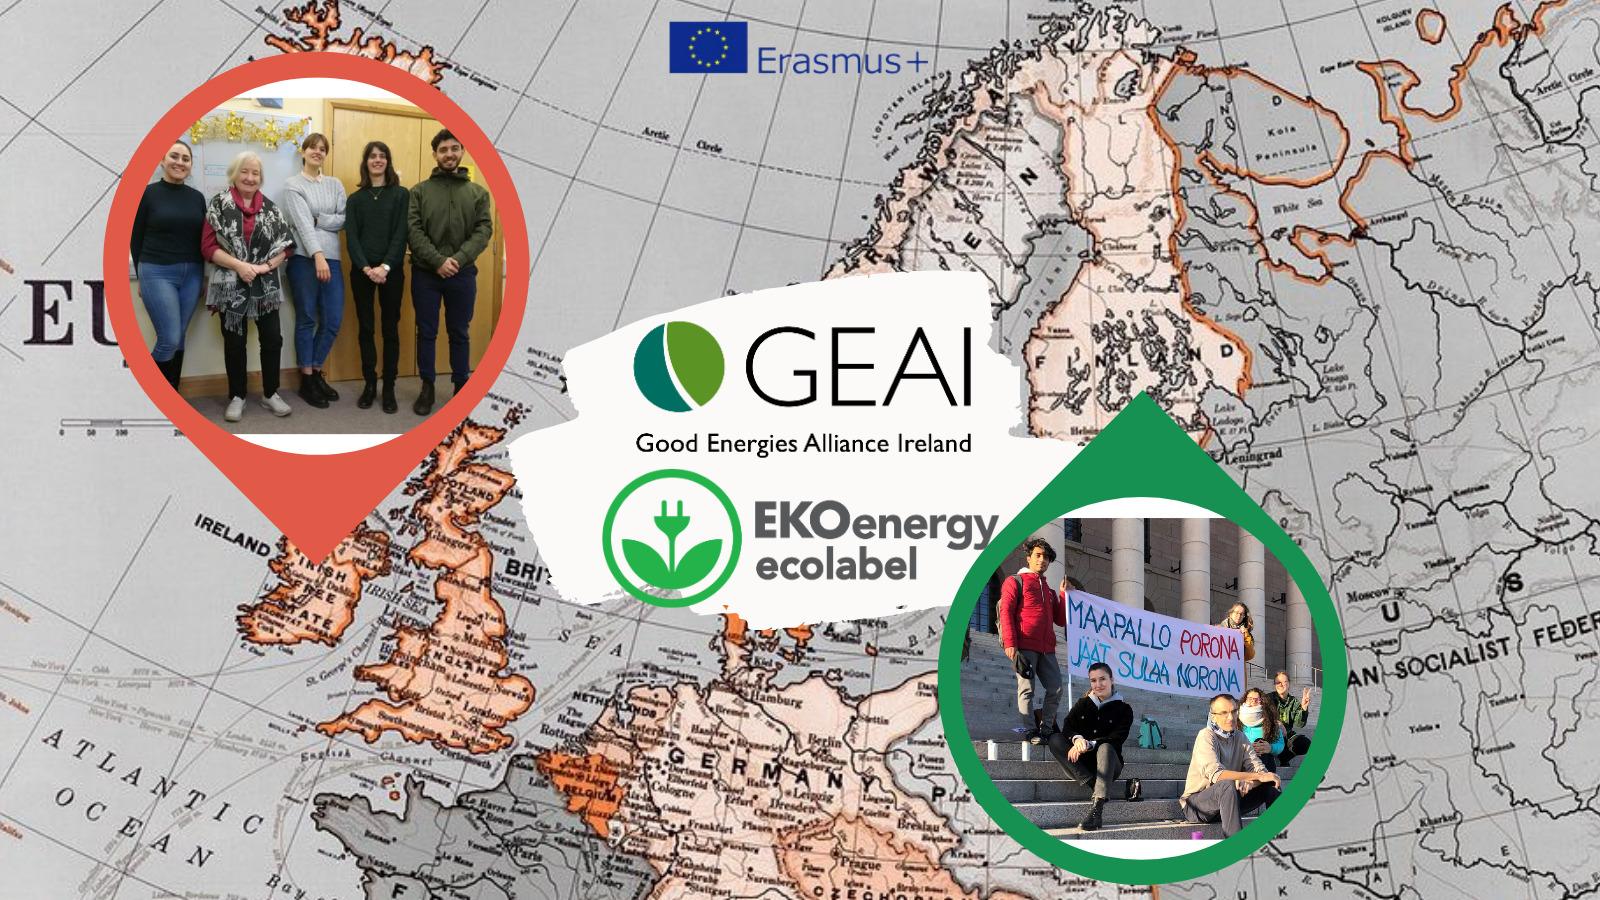 NGOs cooperating towards climate action: Good Energies Alliance Ireland and EKOenergy